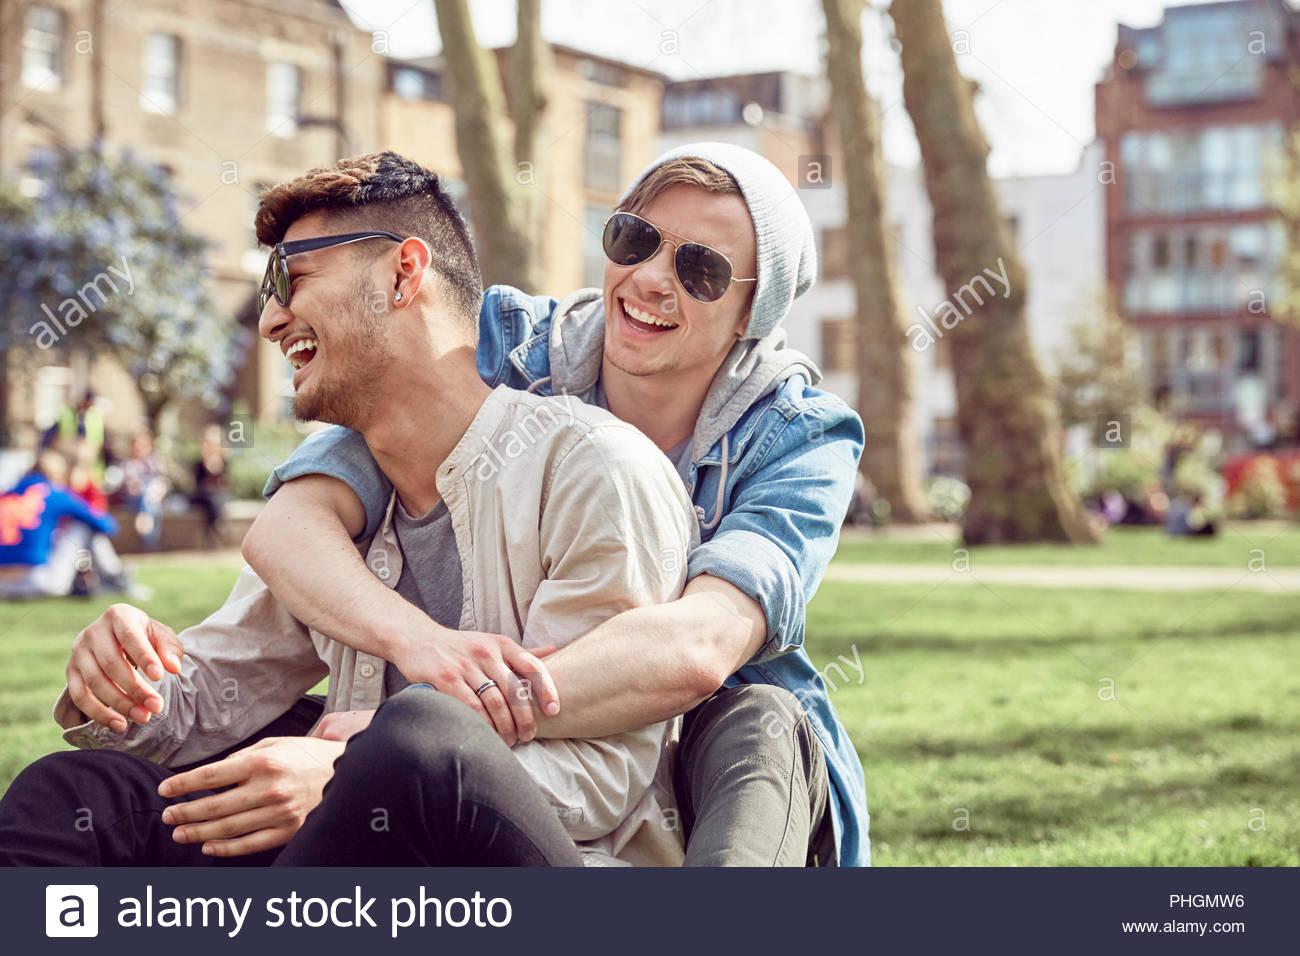 Amici Gay Teen All Aperto